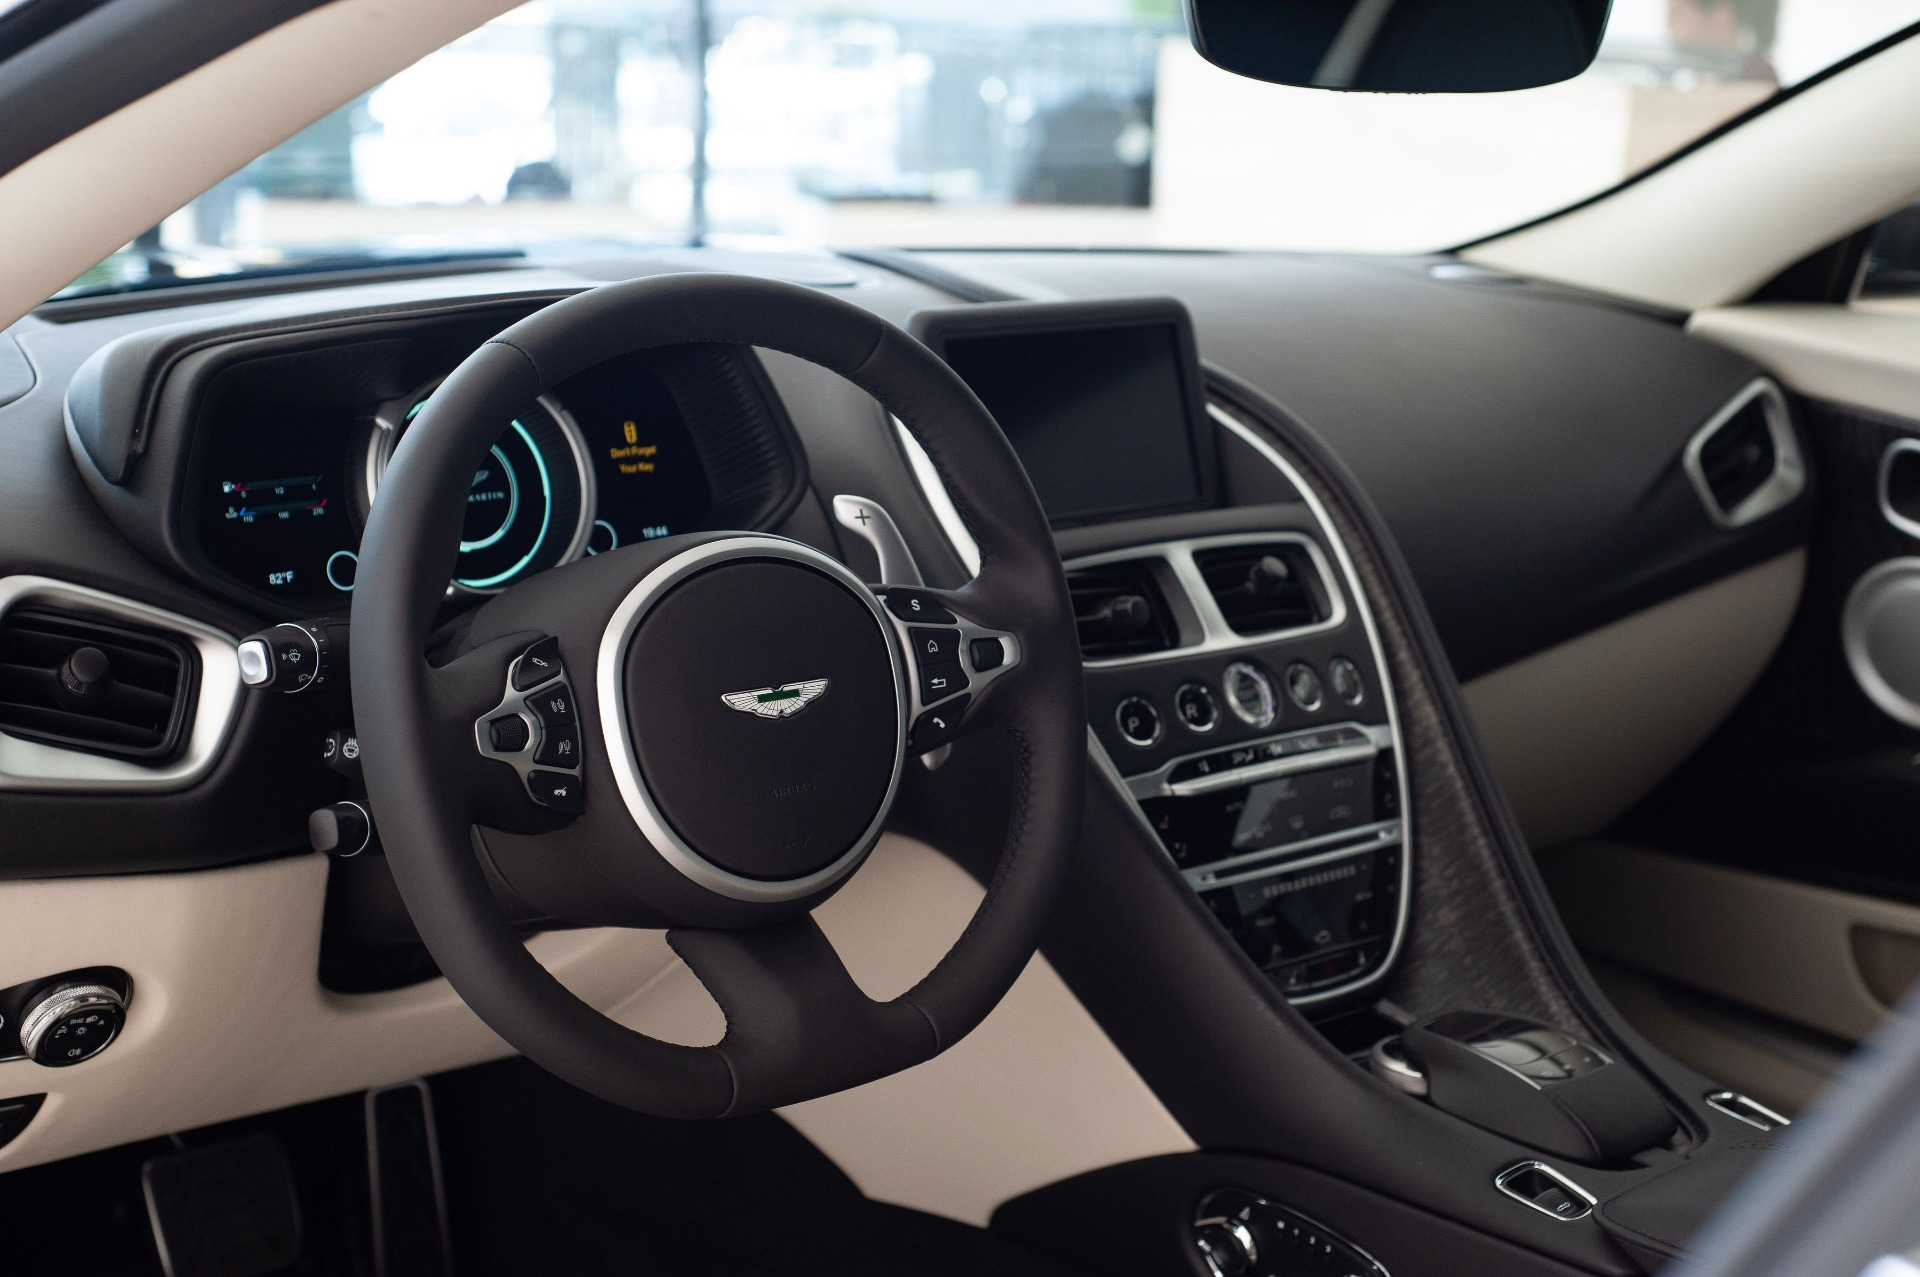 2019 Aston Martin Db11 Volante Stock 9nm06654 For Sale Near Vienna